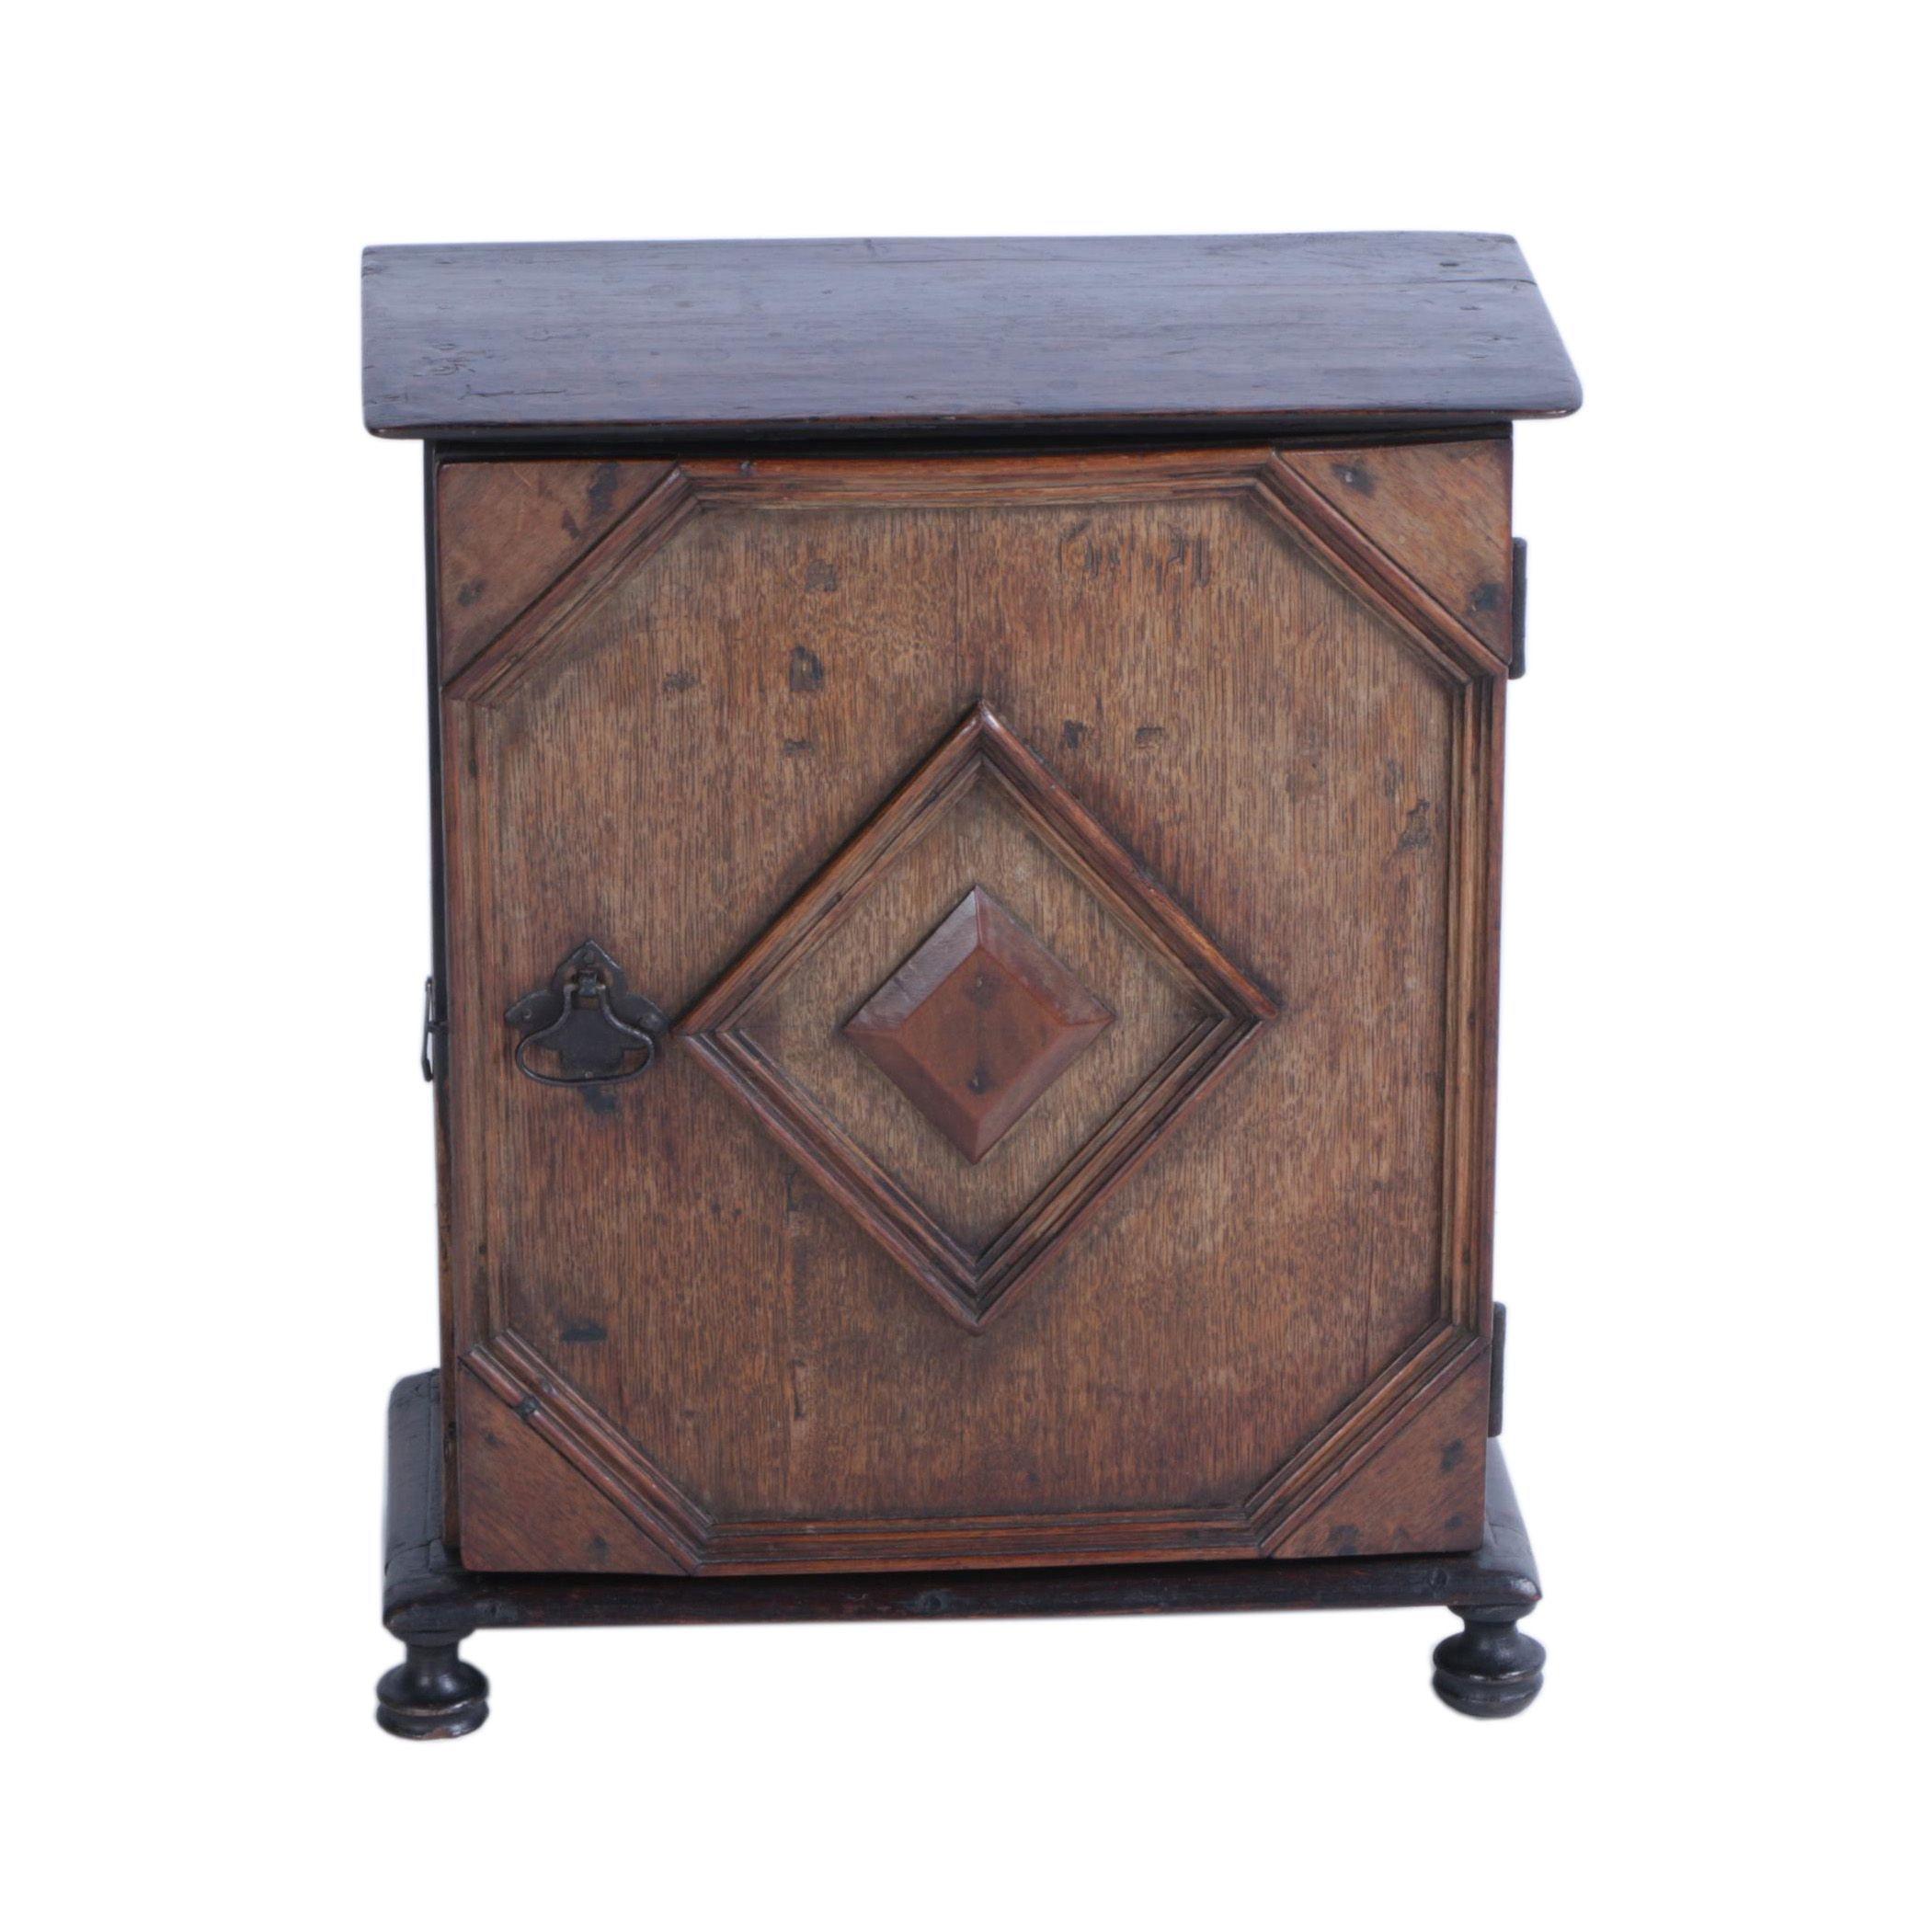 Antique William & Mary Style Oak Spice Chest, Circa 1700